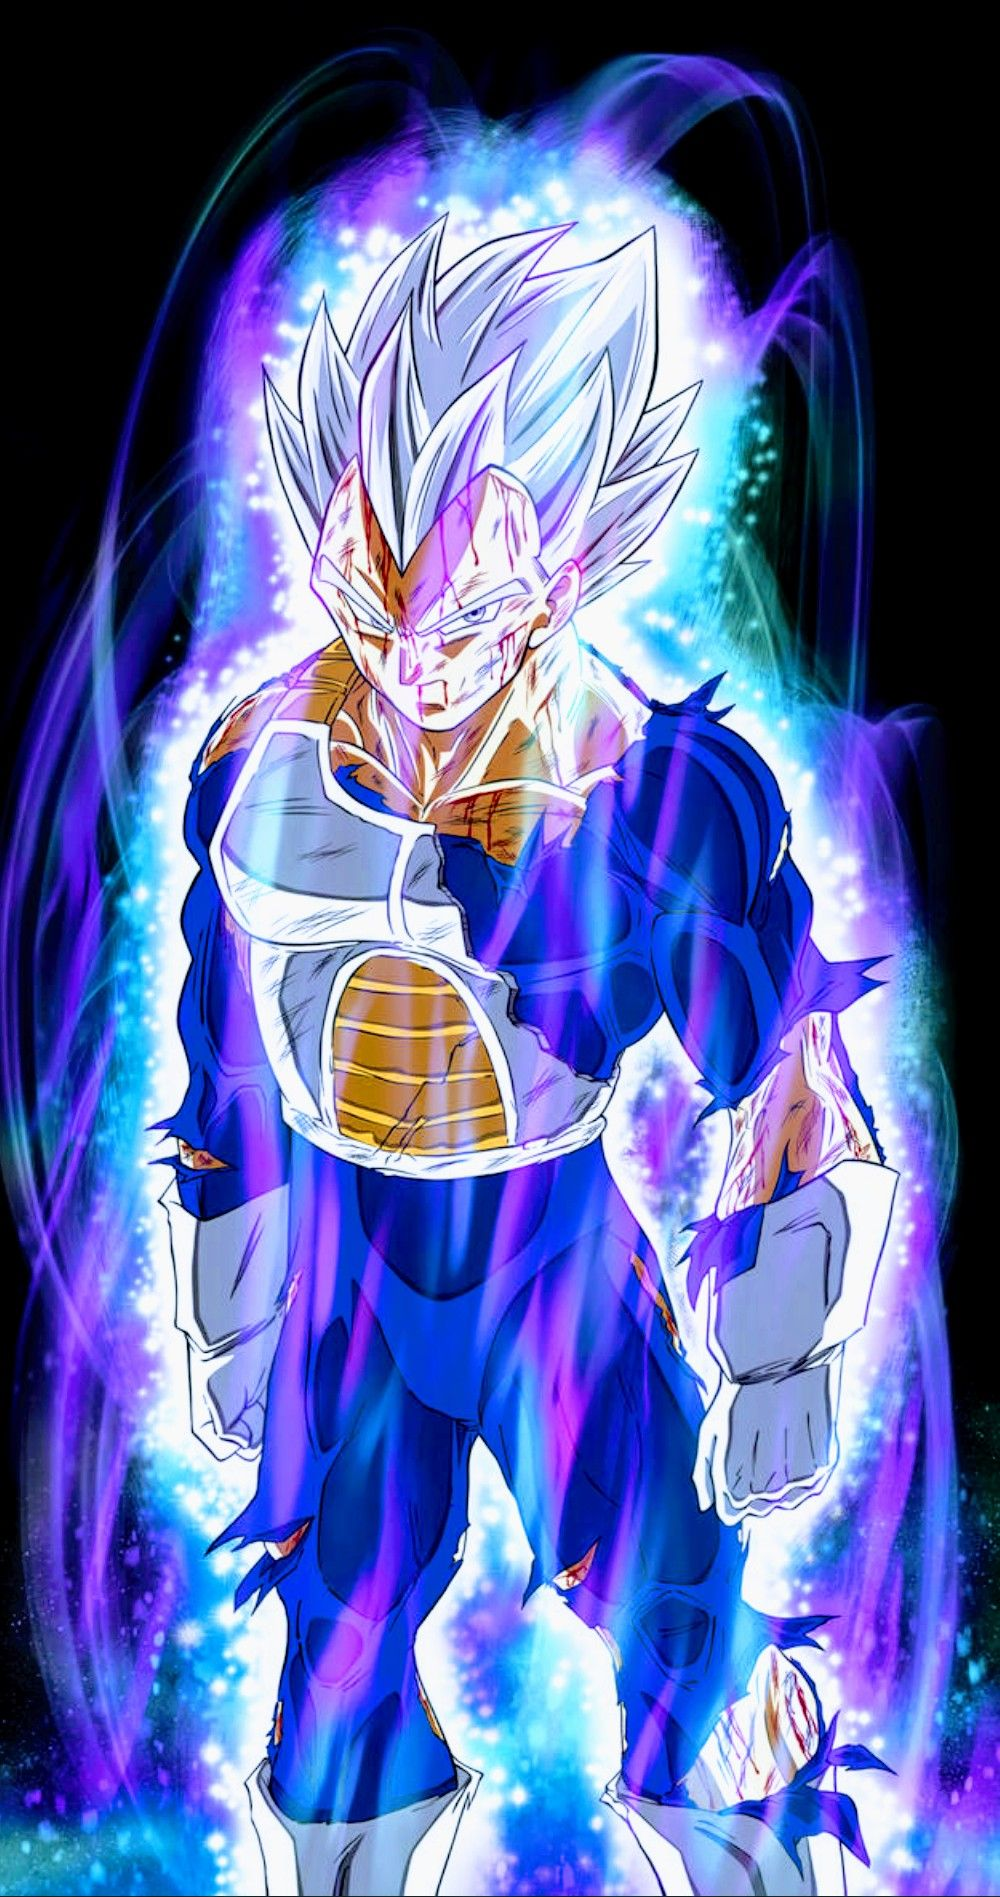 Vegeta Ultra Instinct Mastered Dragon Ball Super Dragon Ball Artwork Dragon Ball Super Wallpapers Anime Dragon Ball